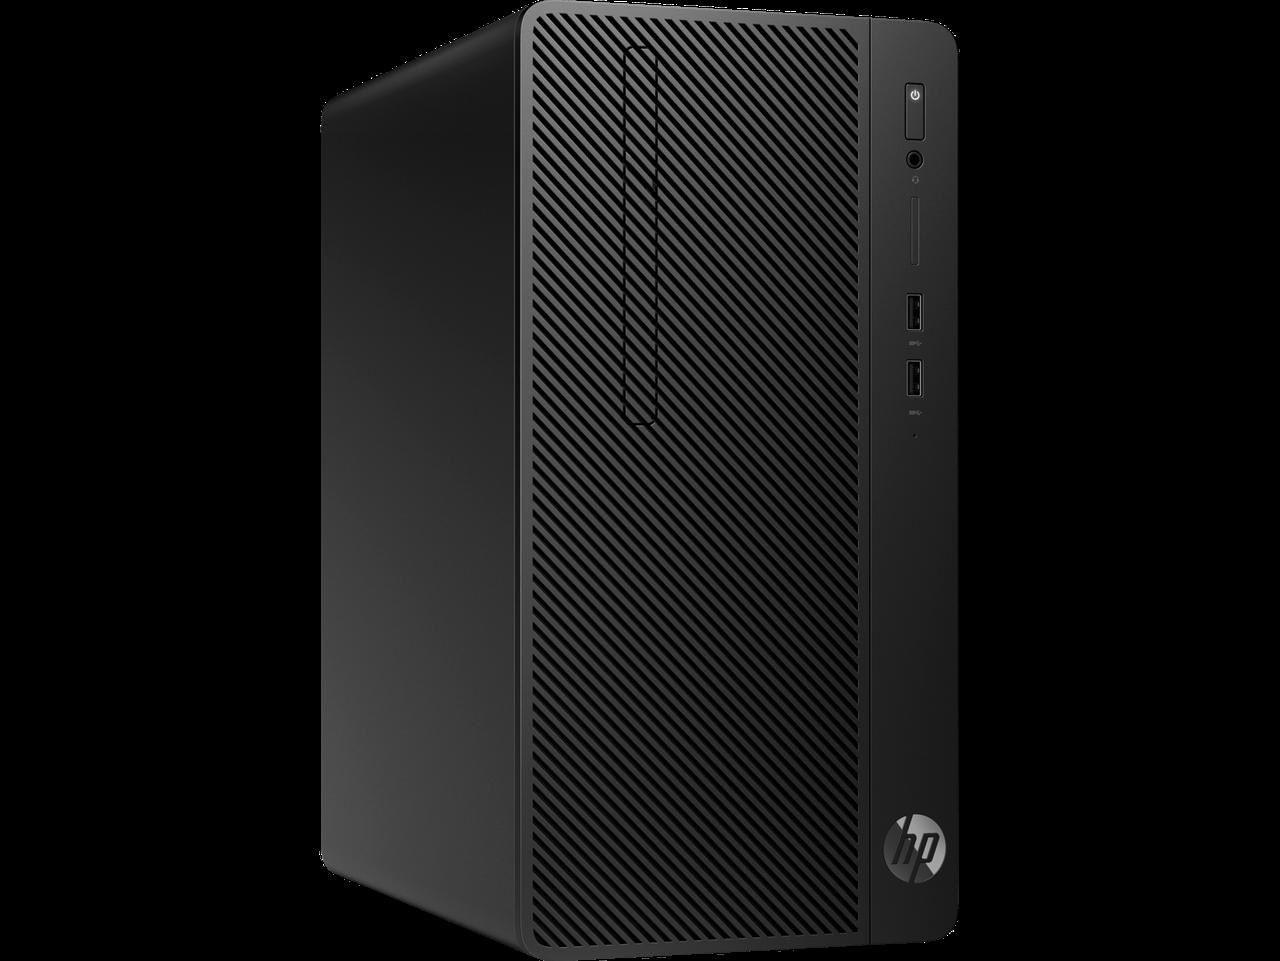 Компьютер HP 3ZD06EA 290 G2 MT i5-8500 256GB 8.0GB DVDRW Win10 Pro i5-8500 / 8GB / 256GB M.2 2280 PCIe NVMe /